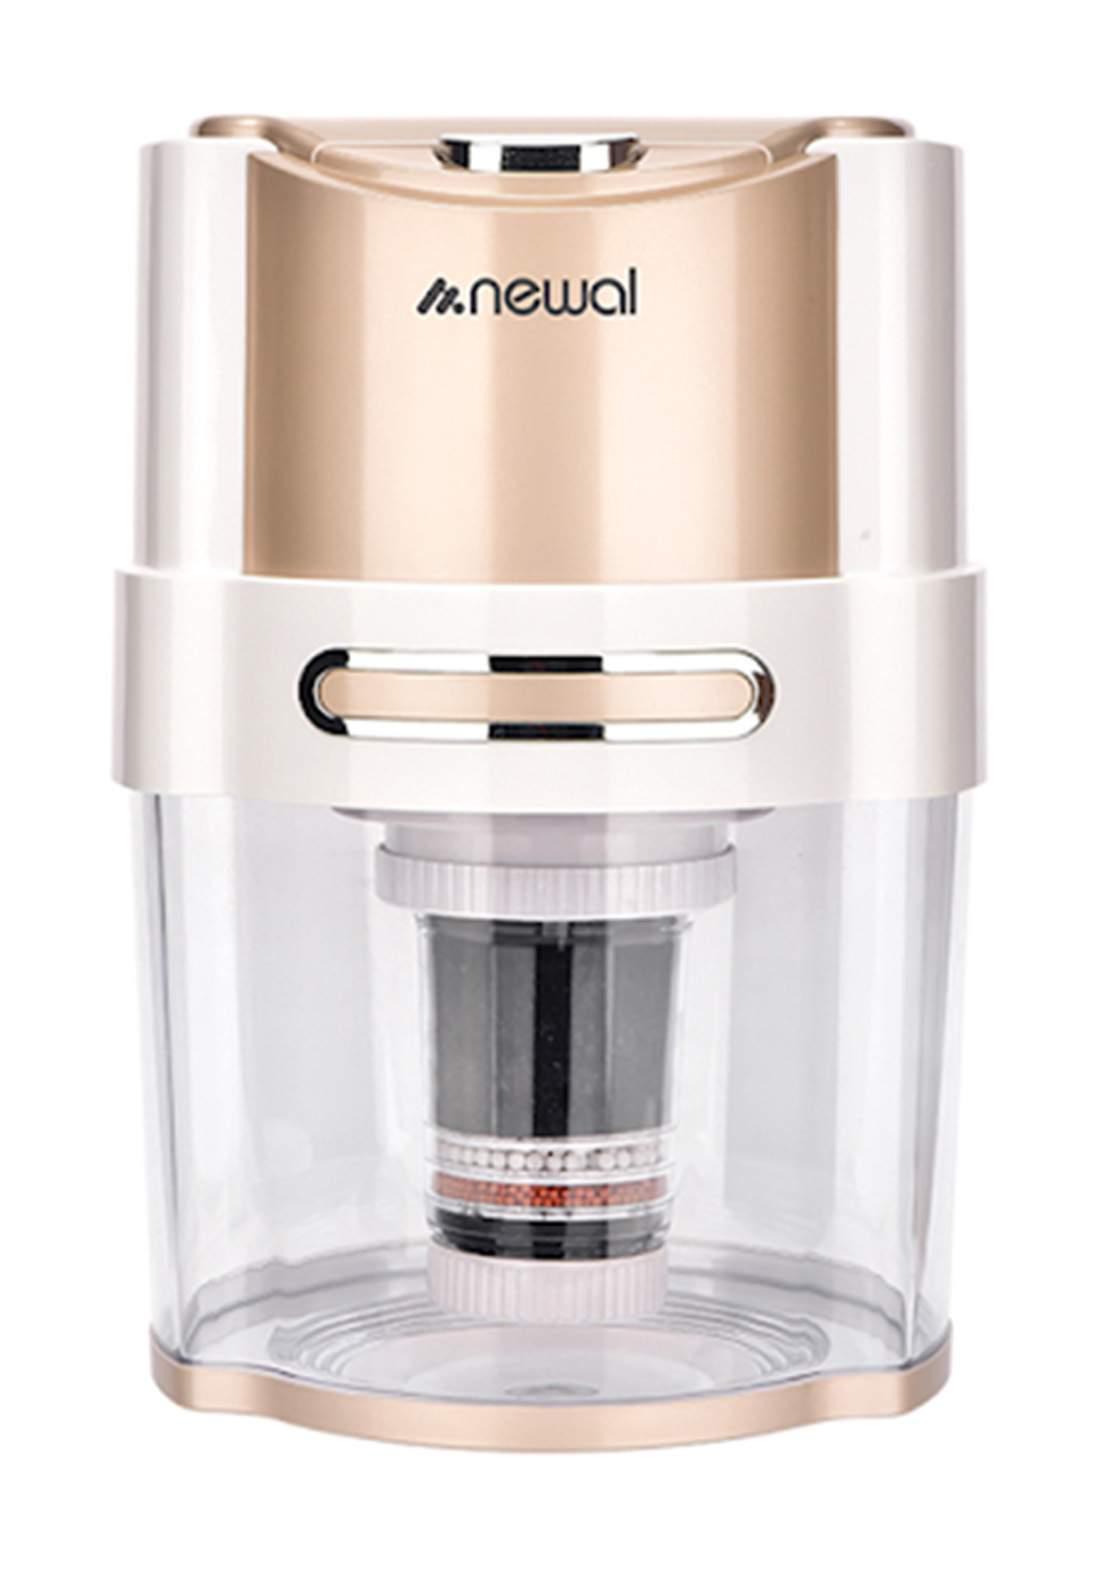 Newal WTP-031-04 Water Purifier خزان ماء مع فلتر